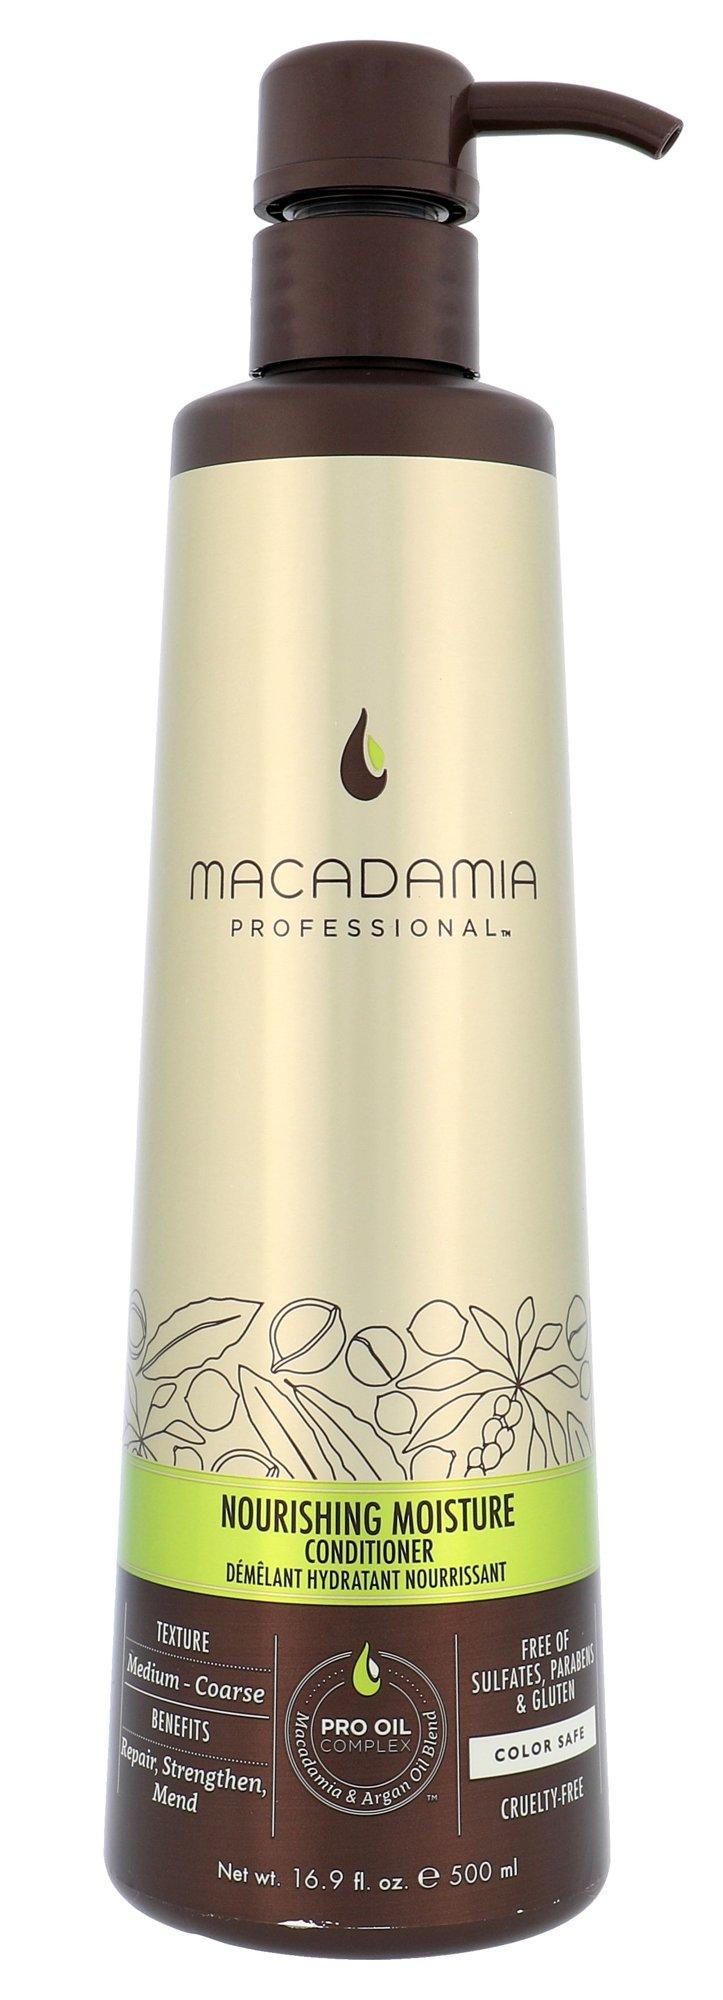 Macadamia Professional Nourishing Moisture Cosmetic 500ml